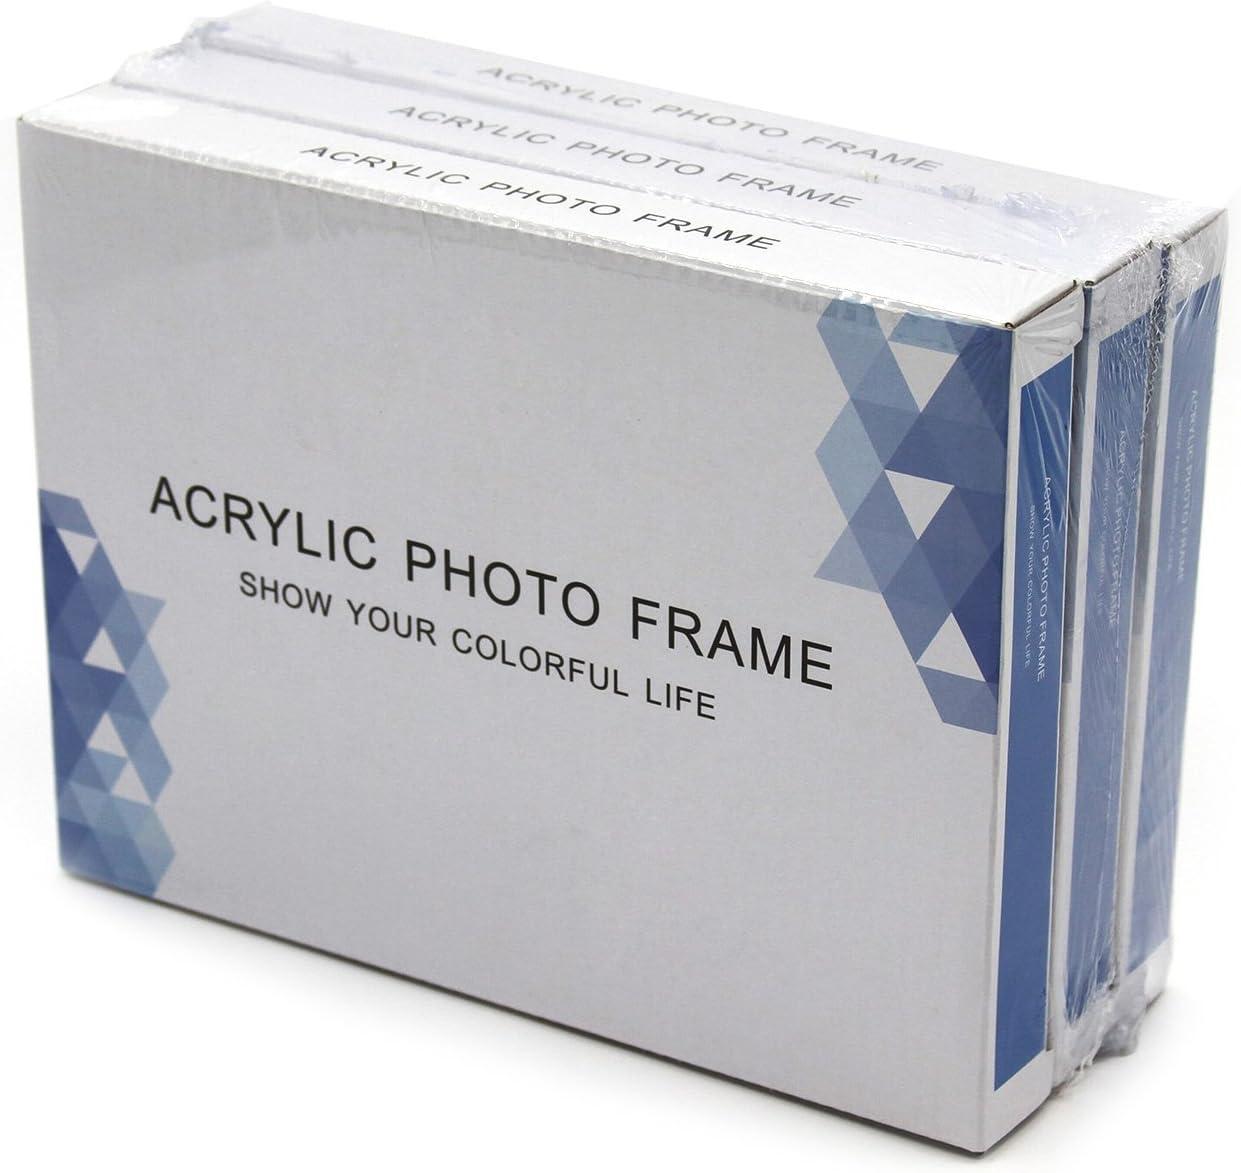 Lot de 5 Cadres Photos 9 x 13 cm Lot de 5 Boxalls Cadre Photo 9 x 13 cm Acrylique Transparent Profil de Cadre 2 cm !